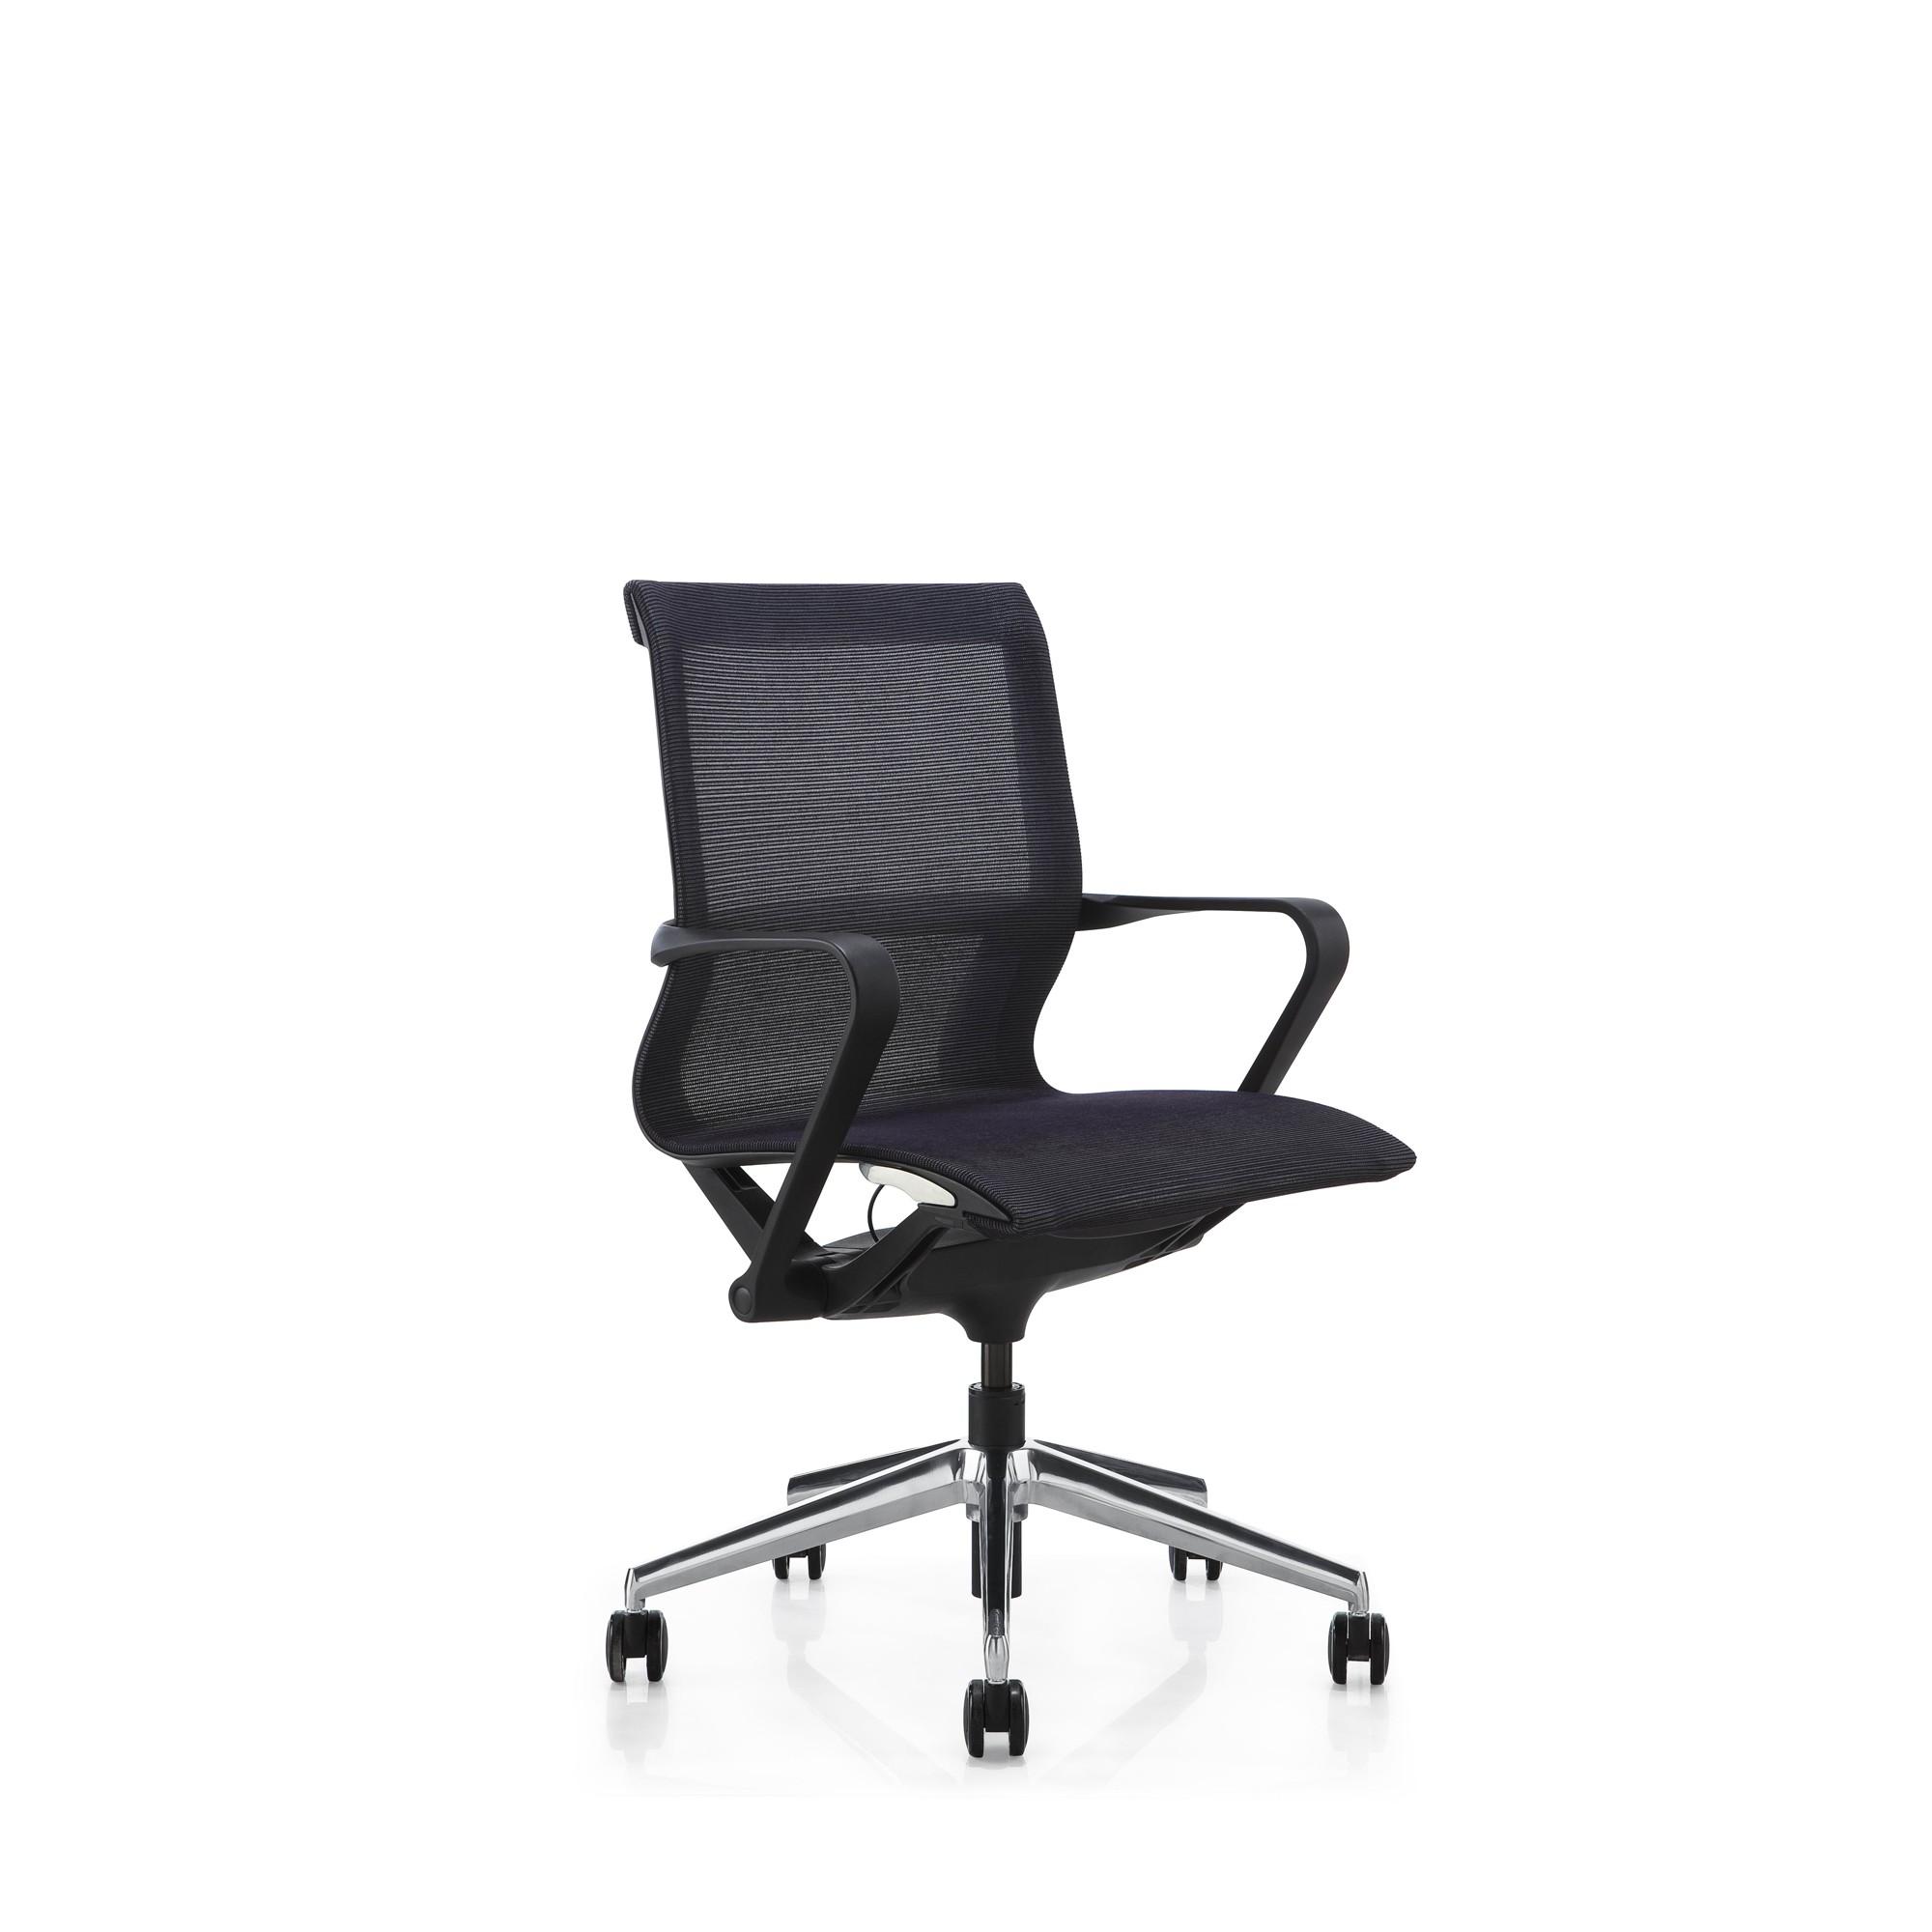 Hilo Series Ergonomic Office Chair Low Back Mesh Chair